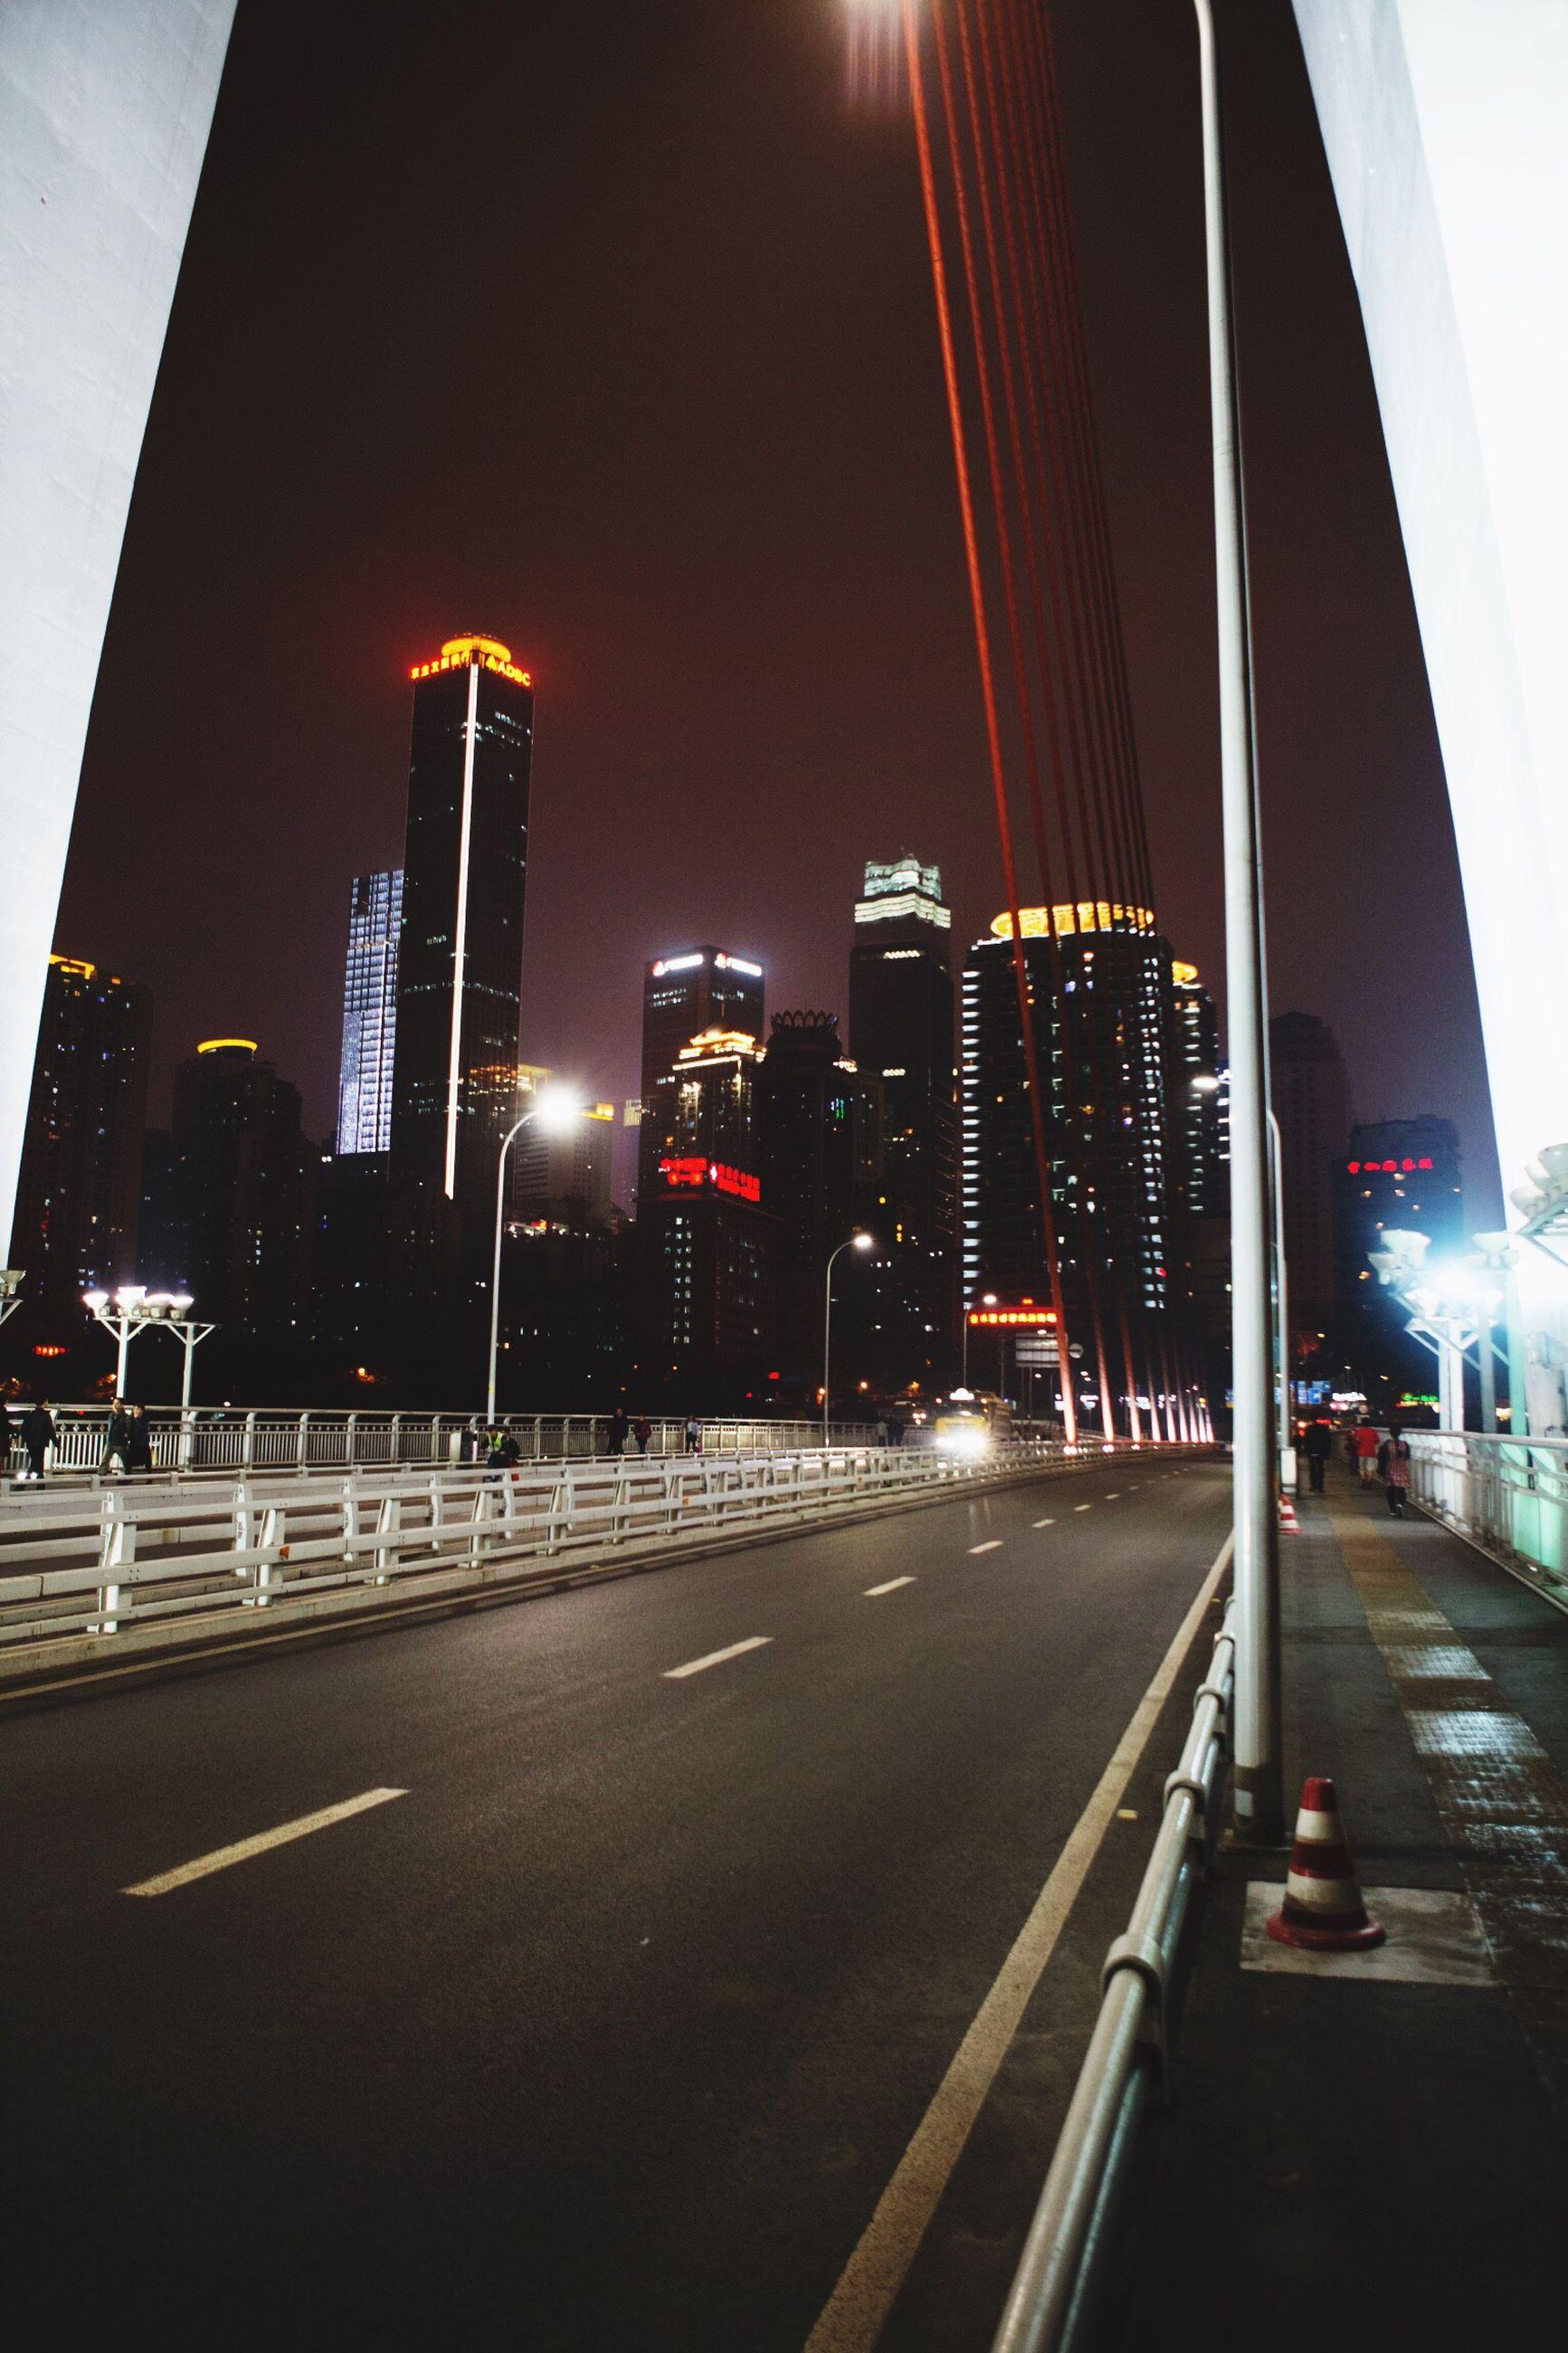 architecture, city, built structure, building exterior, transportation, illuminated, road, outdoors, car, night, modern, no people, skyscraper, urban skyline, sky